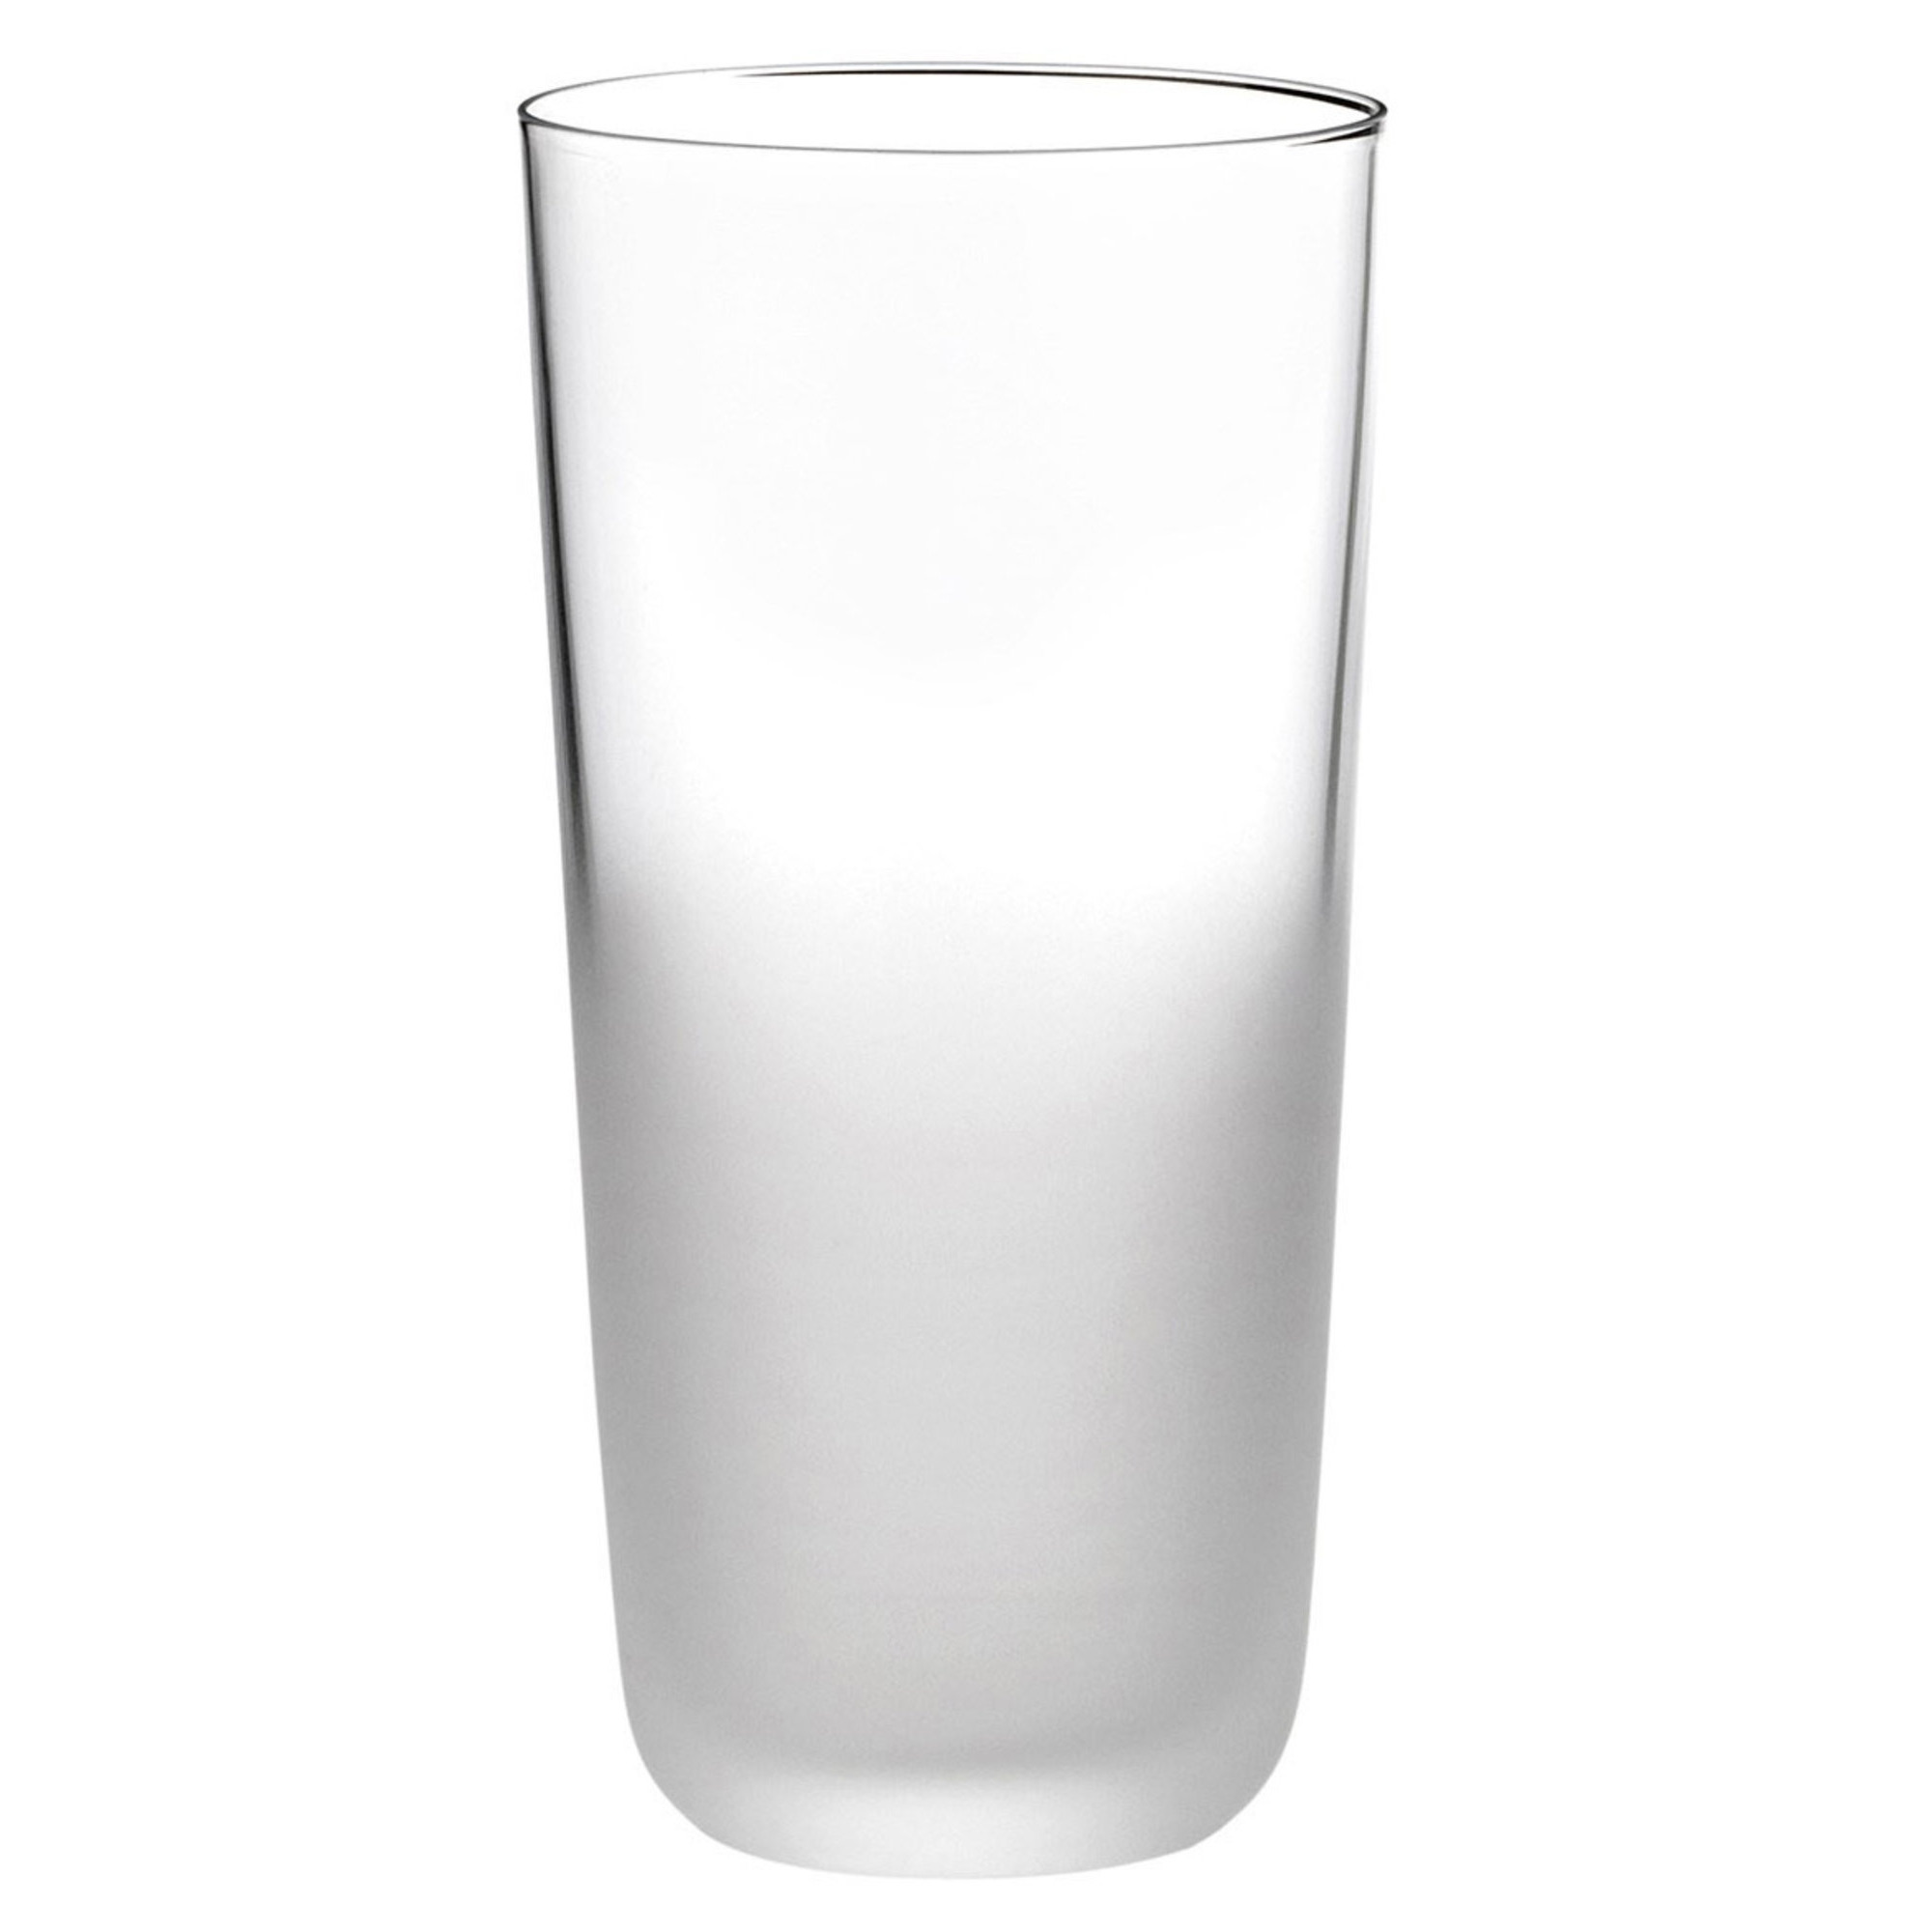 Stelton Frost glas no.2 2-pack